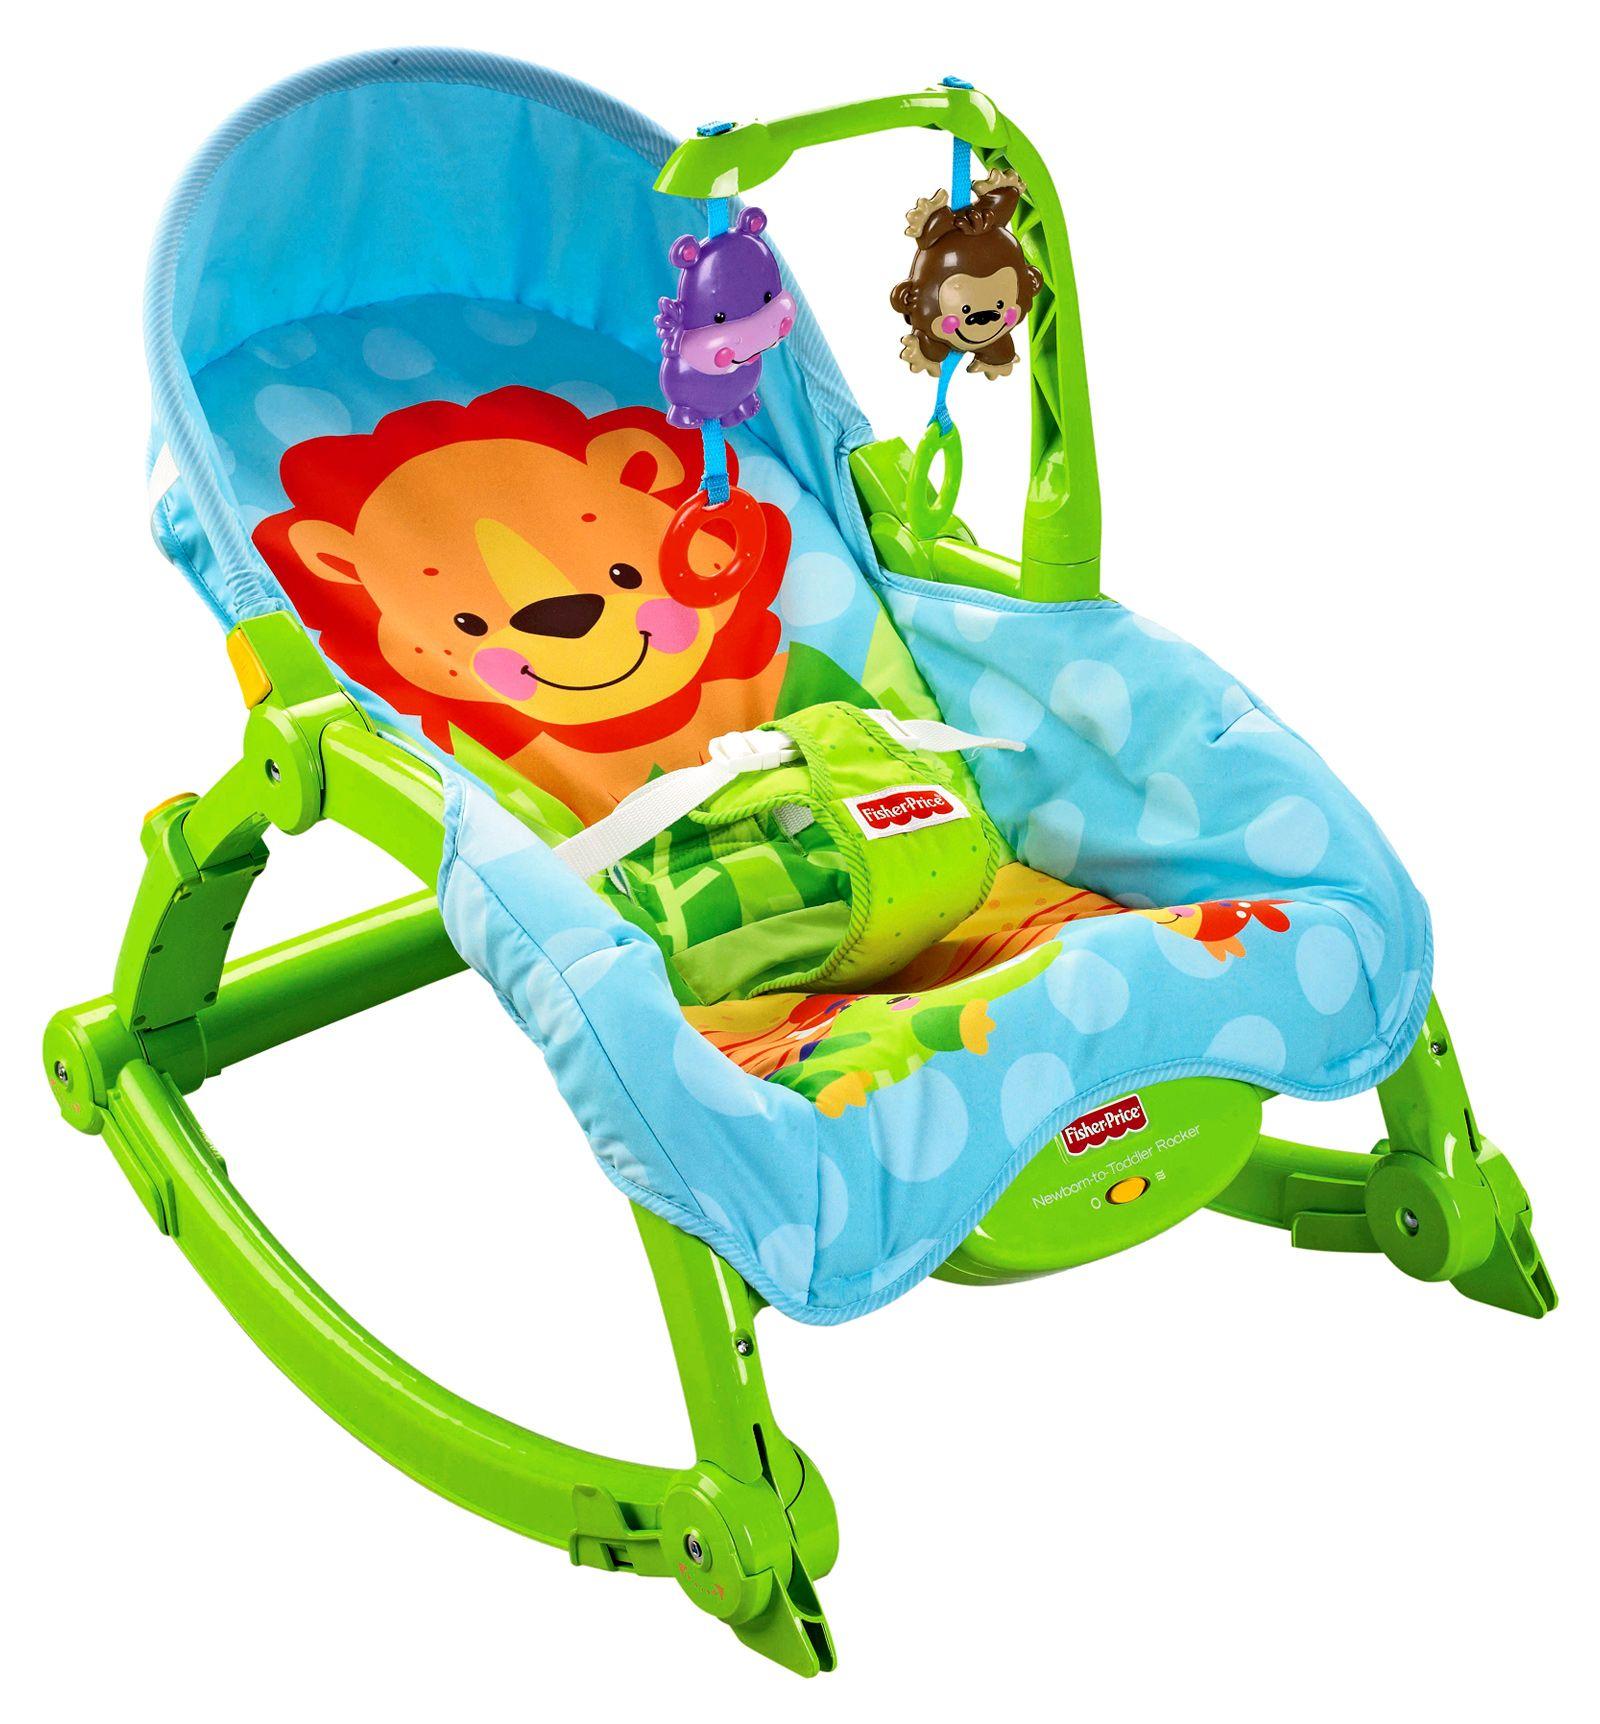 Fisher Price Precious Planet Newborn To Toddler Portable Rocker It